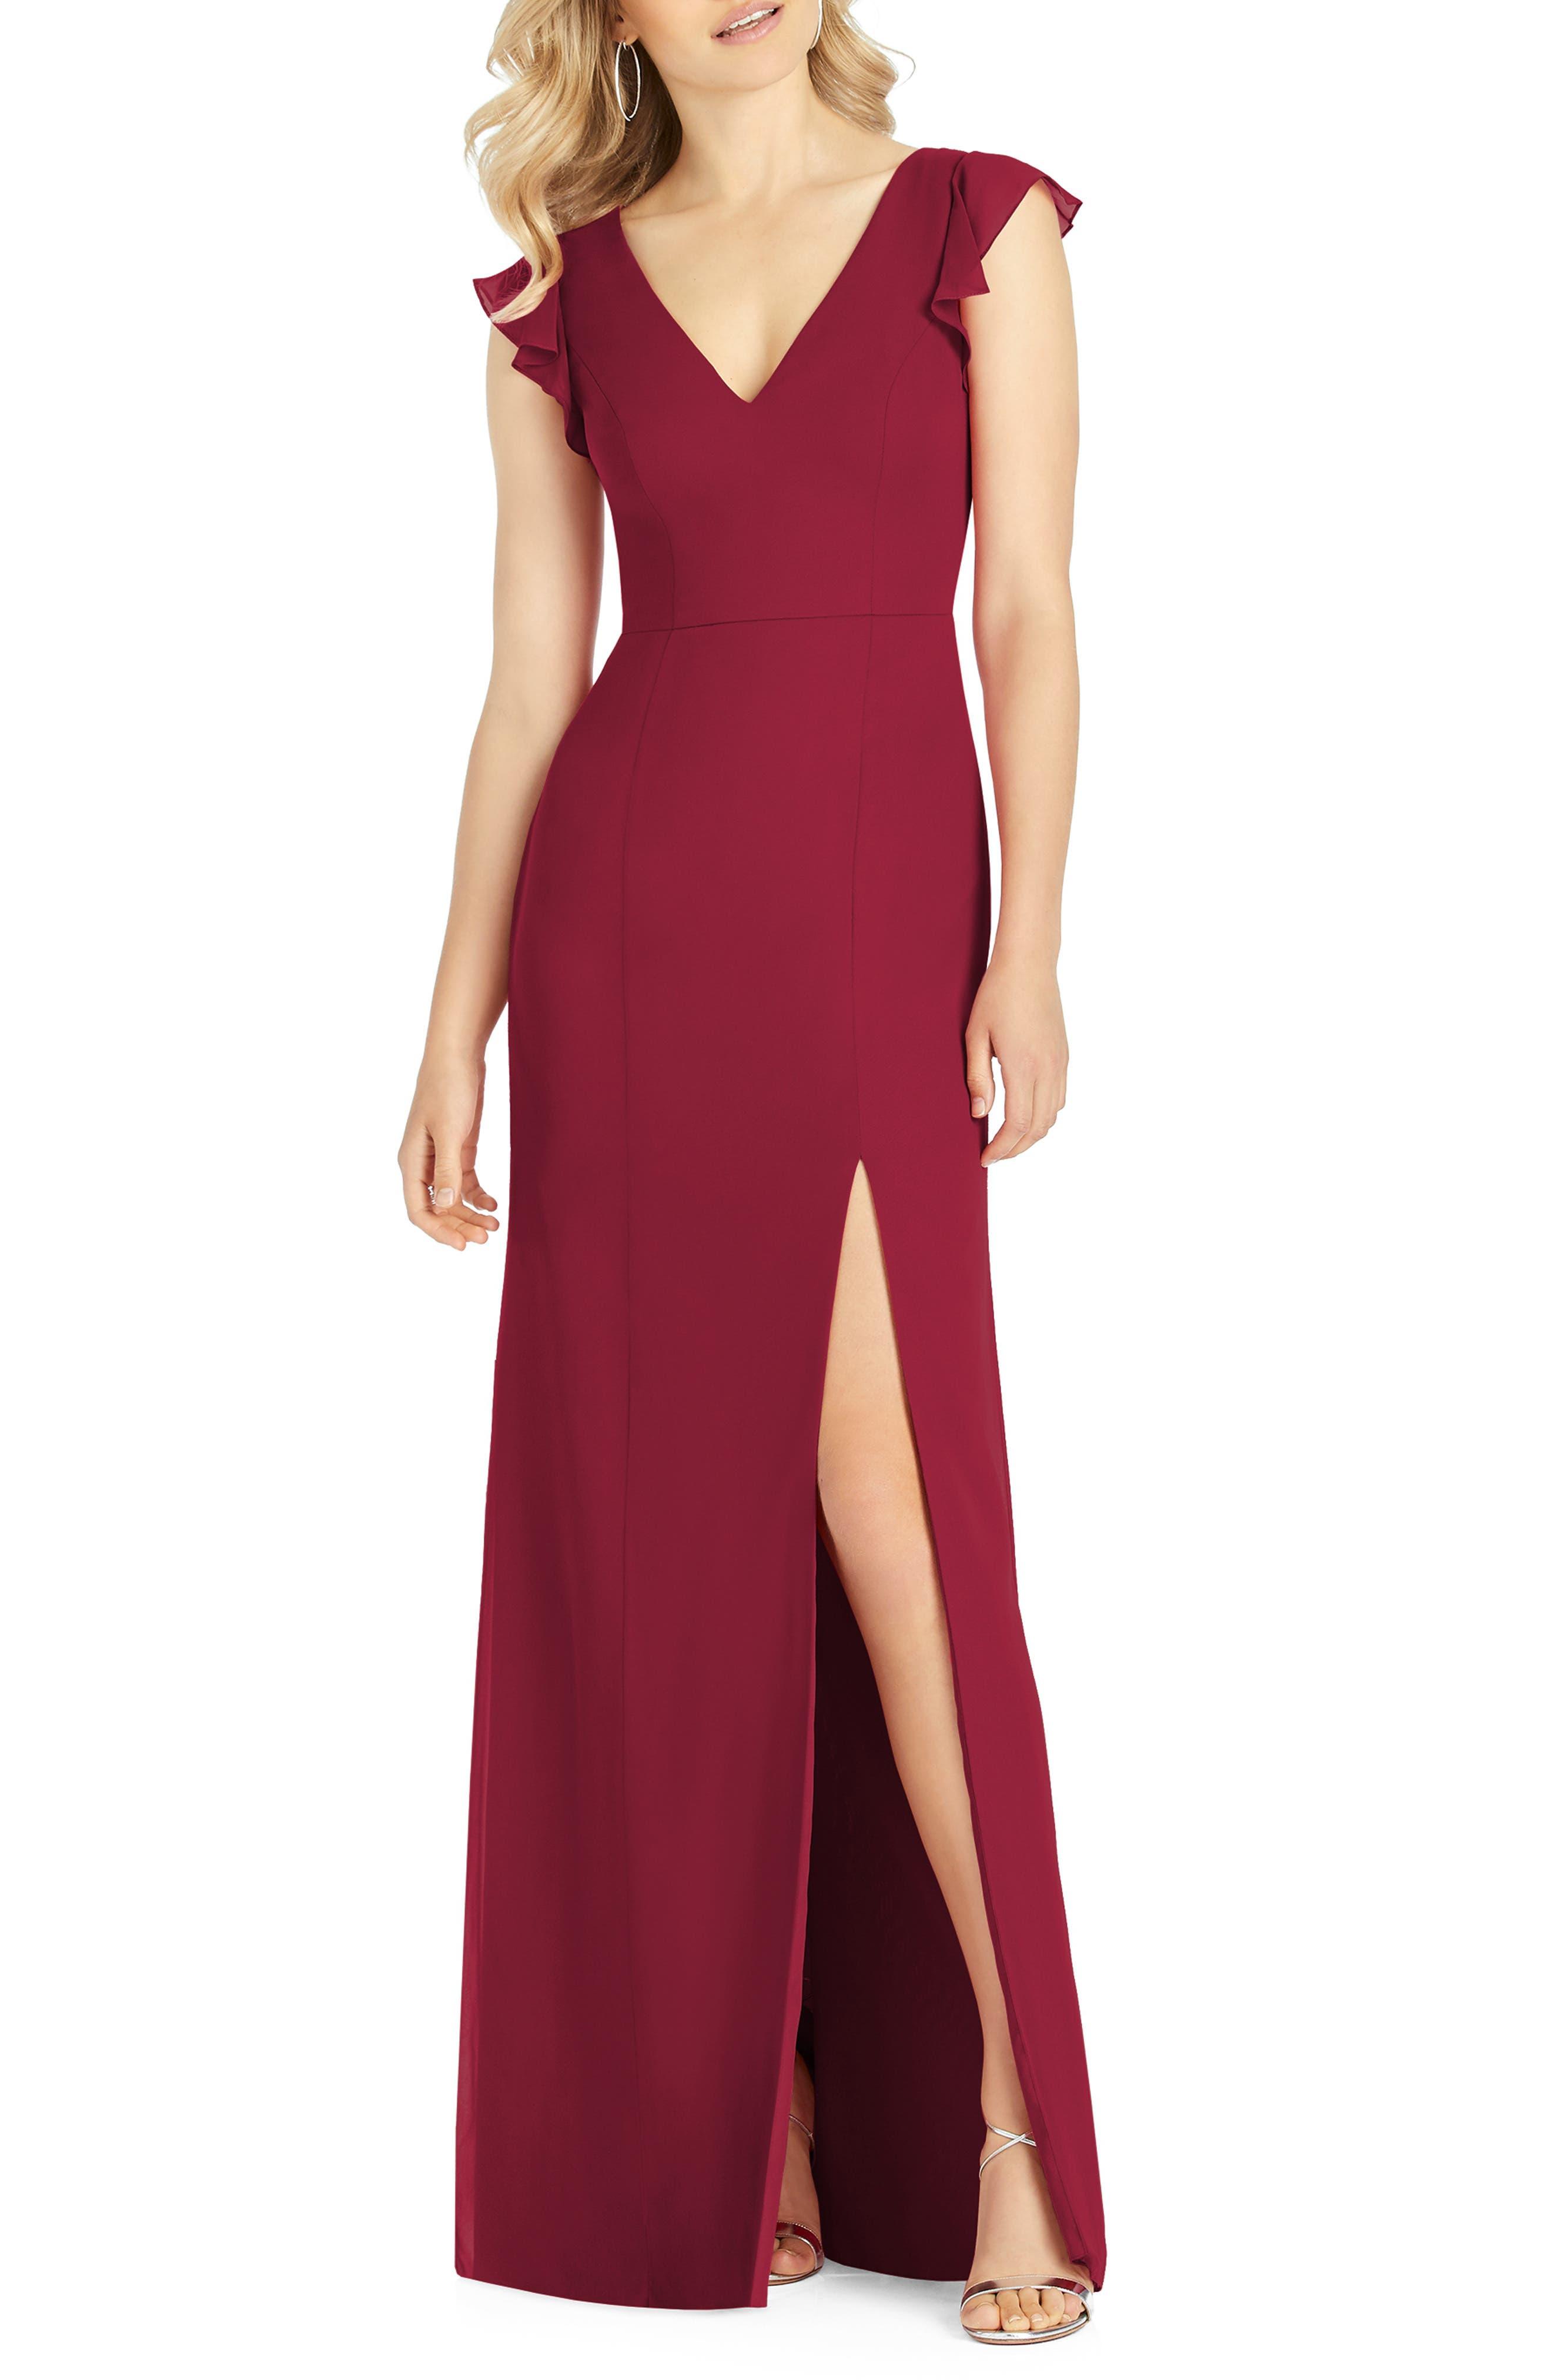 After Six V-Neck Ruffle Sleeve Evening Dress, Burgundy